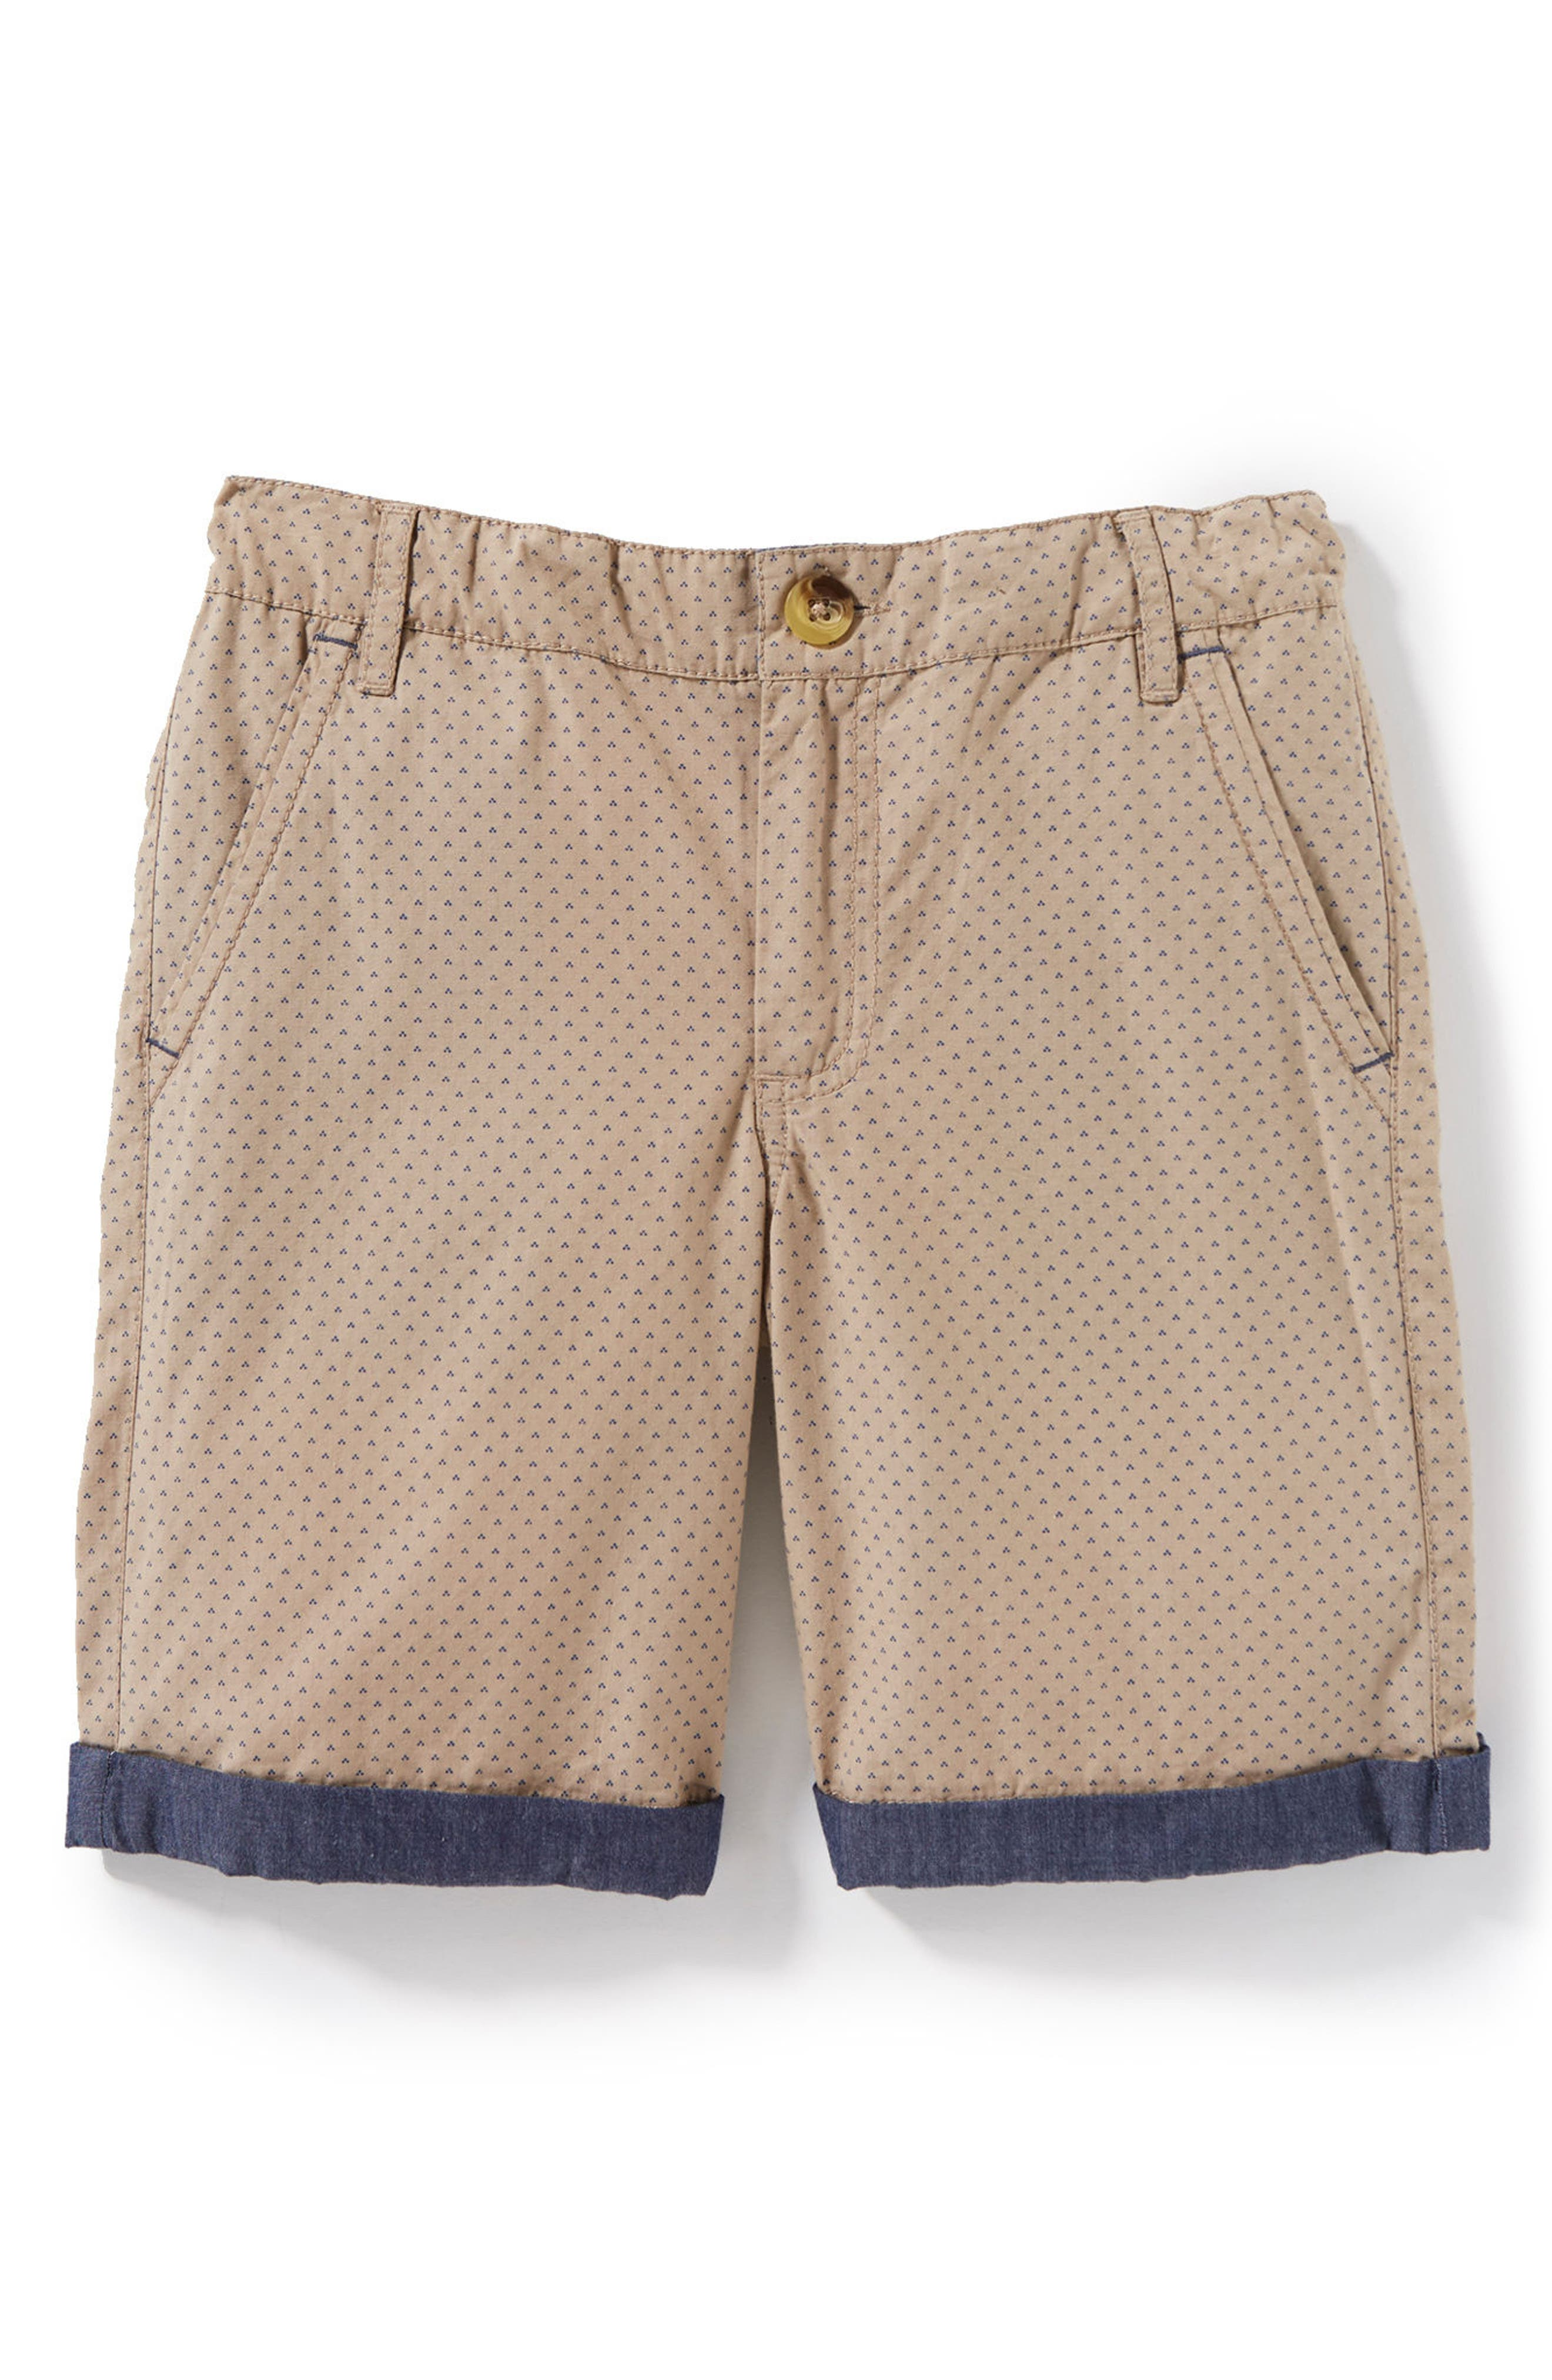 Drew Shorts,                         Main,                         color, 250